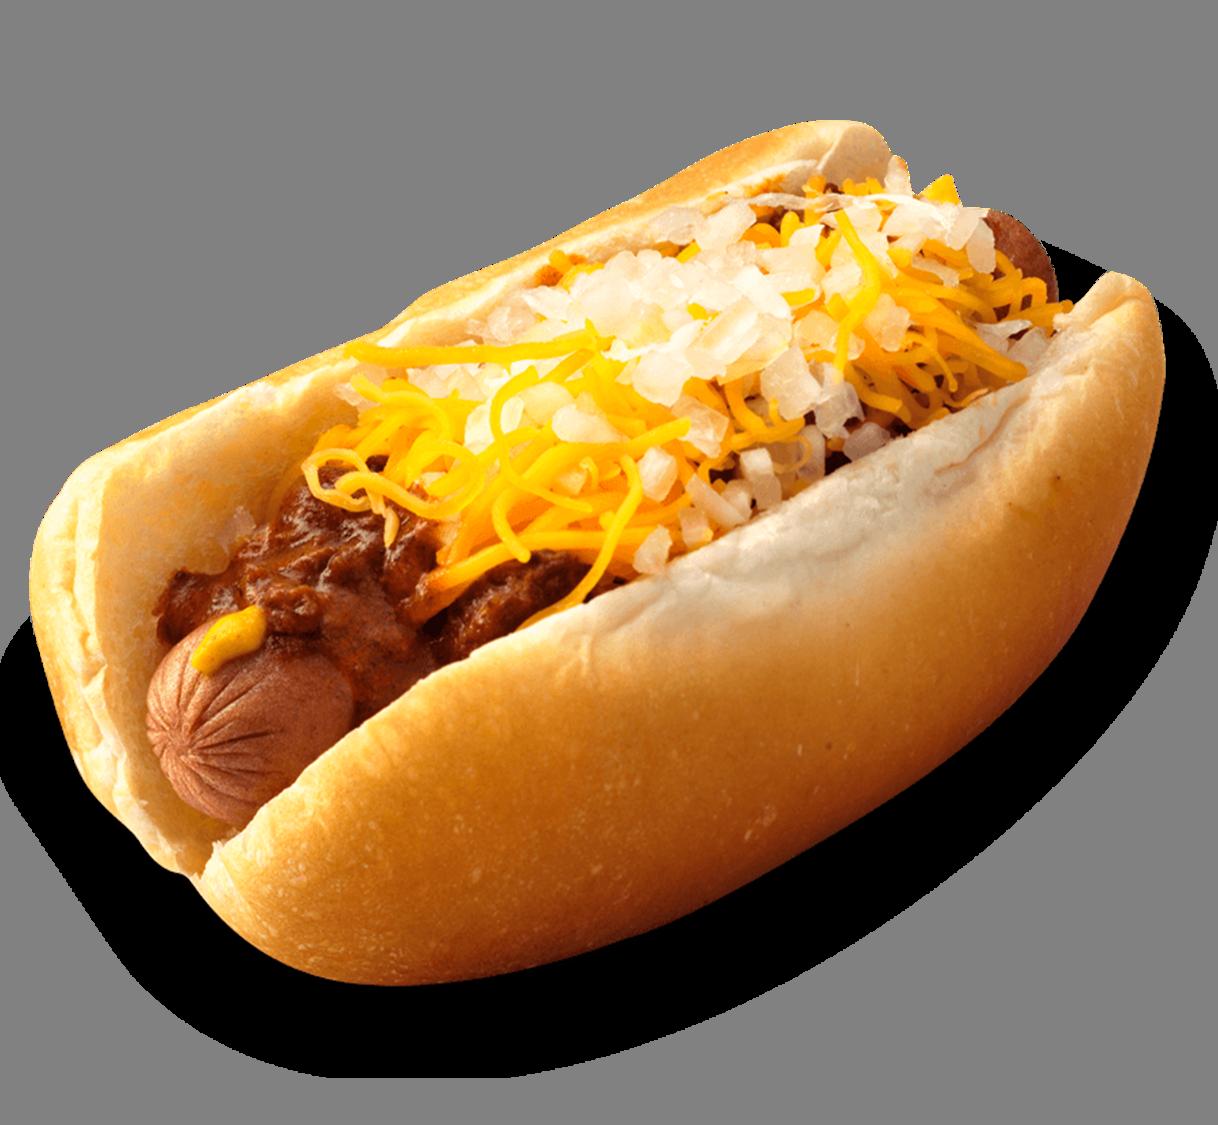 Hamburger and hot dog clipart royalty free stock Chicago-style hot dog Chili dog Chili con carne Hamburger - Hotdog ... royalty free stock